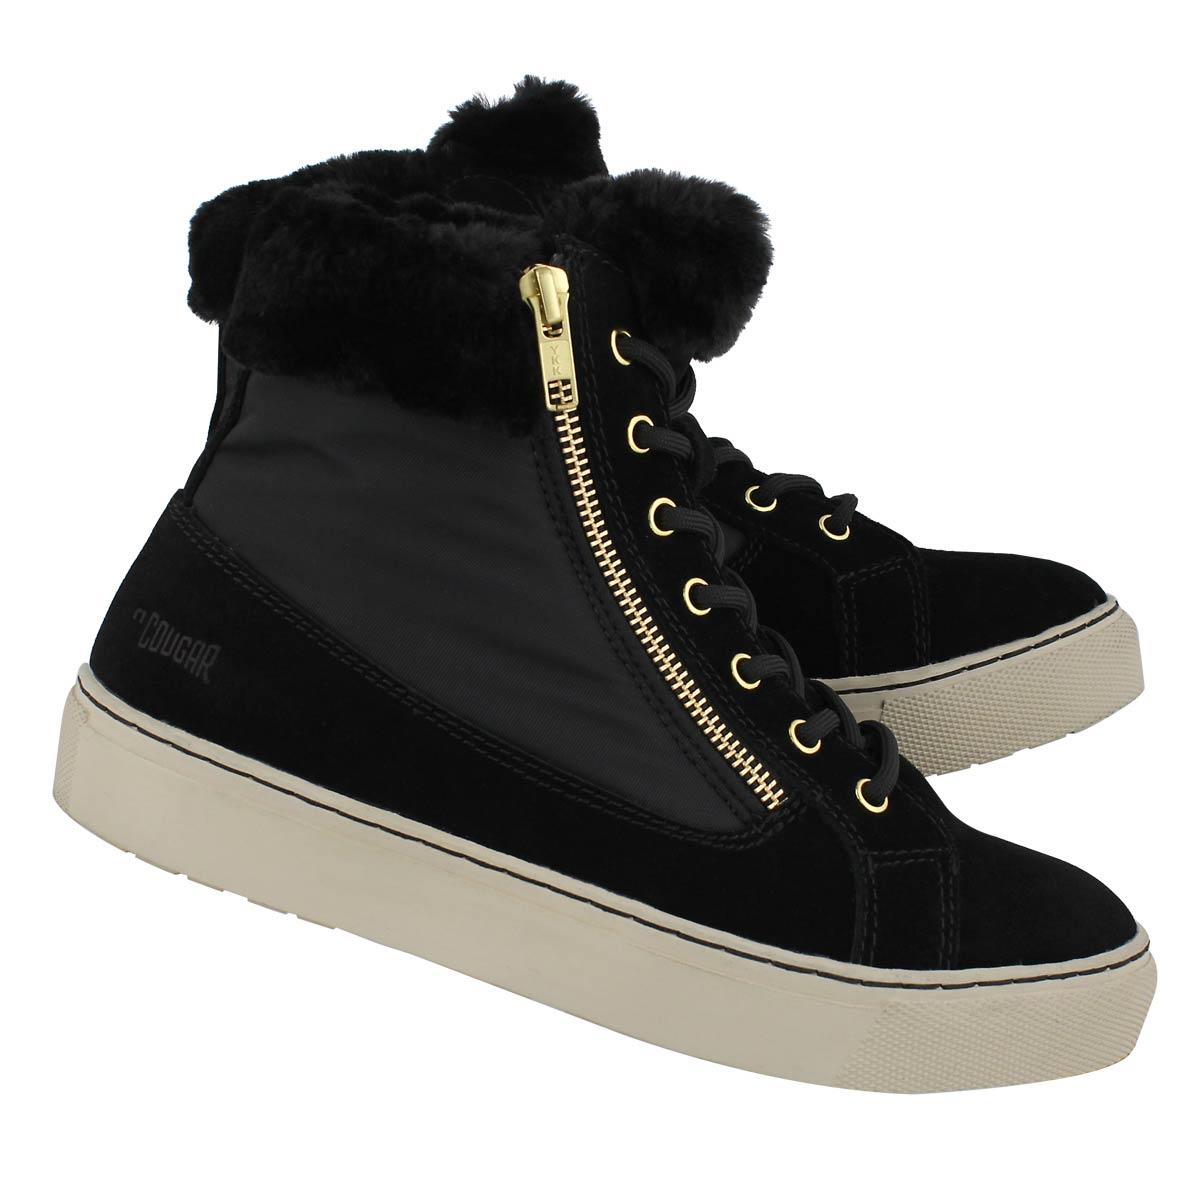 Lds Dublin blk wtpf lace/zip winter boot